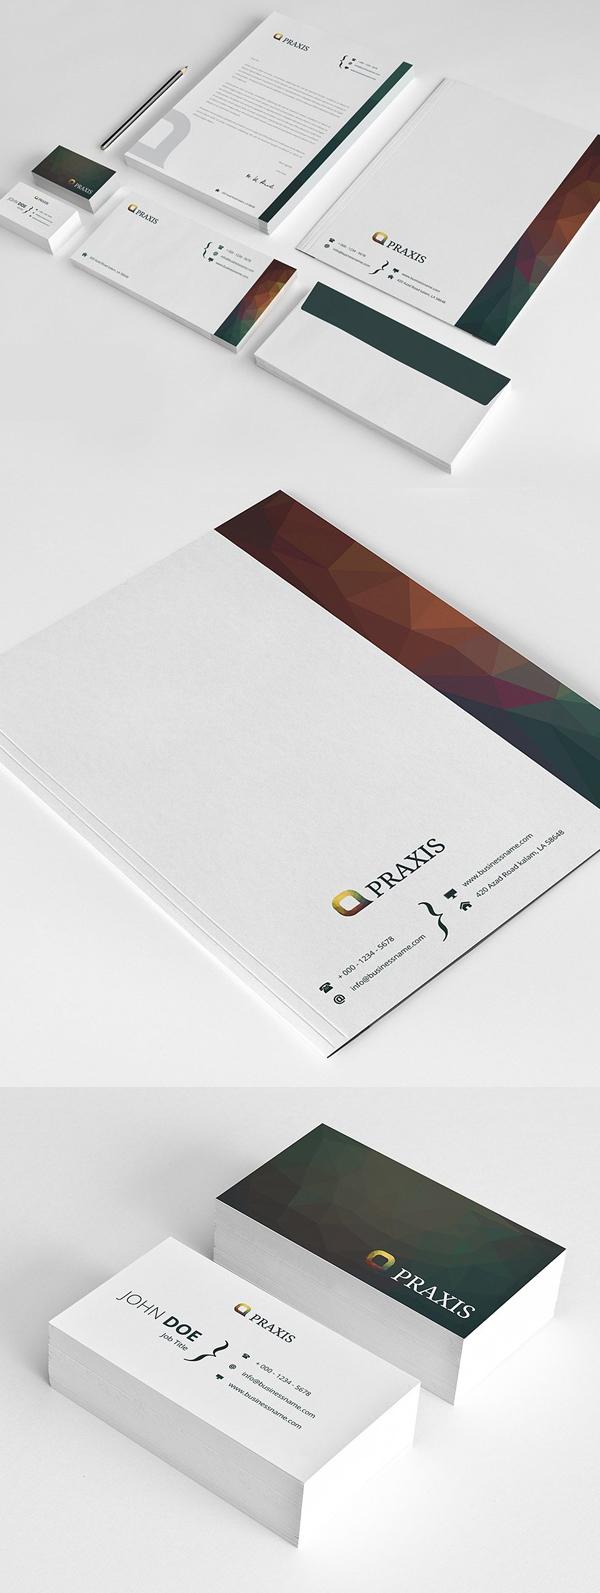 Modern Business Branding / Stationery Templates Design - 8